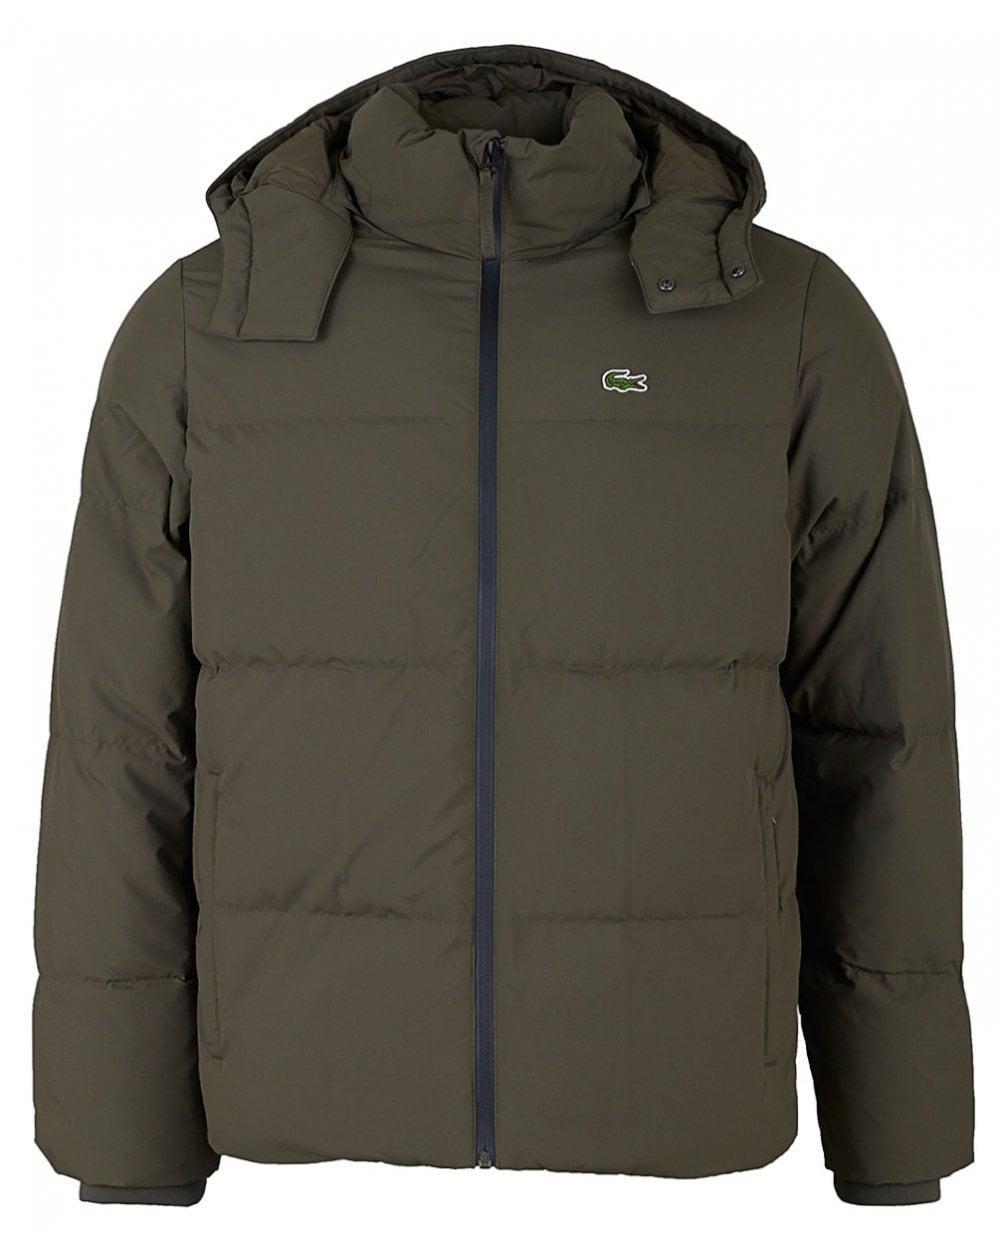 8d845b140a5df4 Lyst - Lacoste Heavy Padded Hooded Jacket in Green for Men